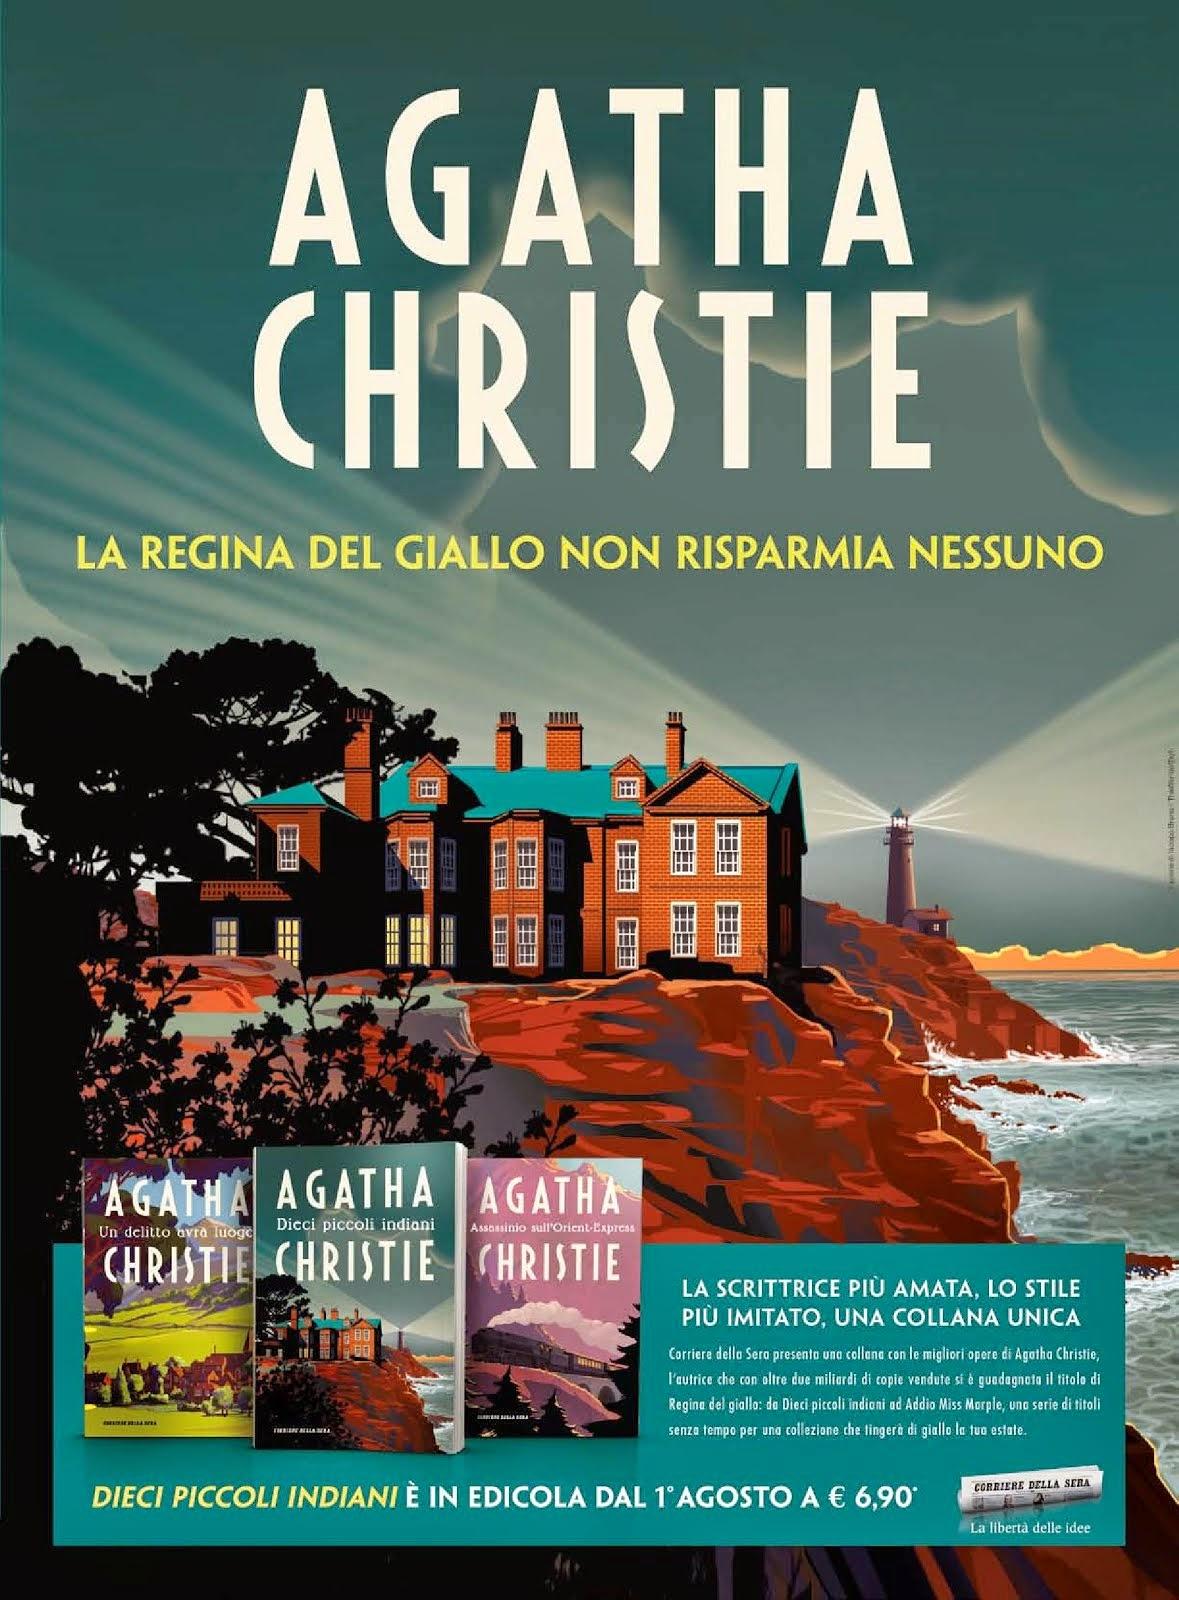 Agatha Christie in edicola